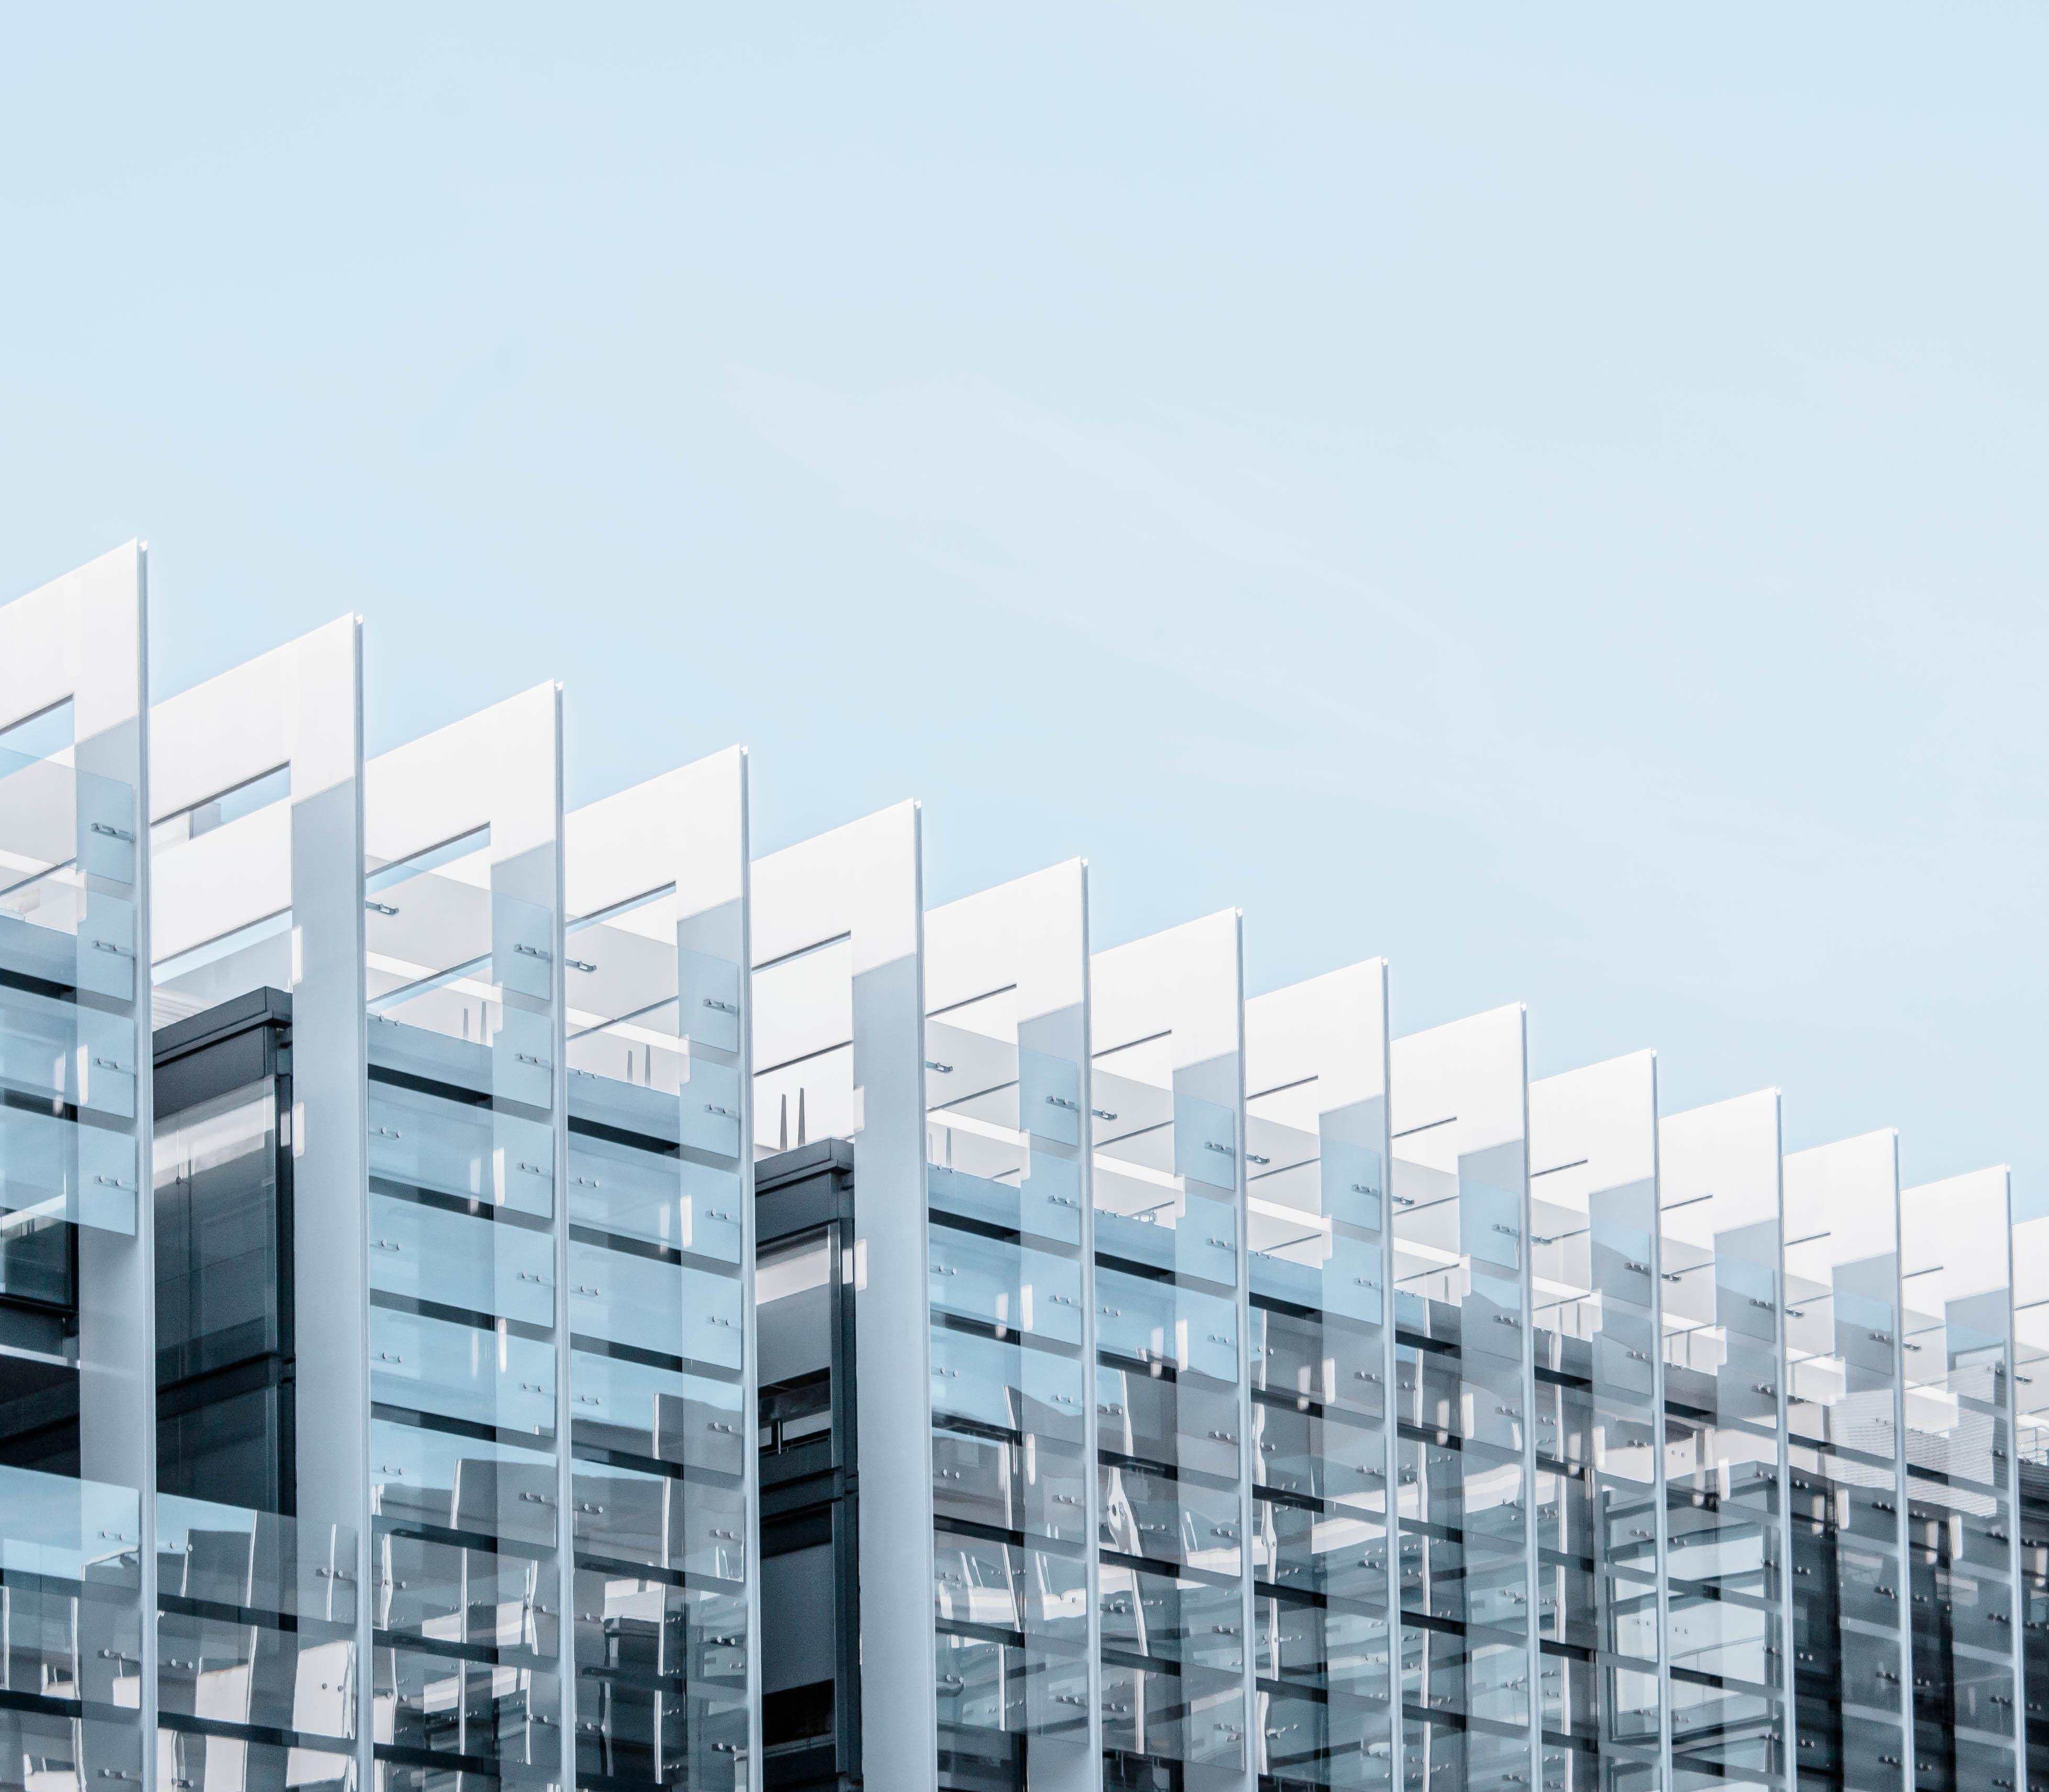 NEMA enclosures for architectural engineering